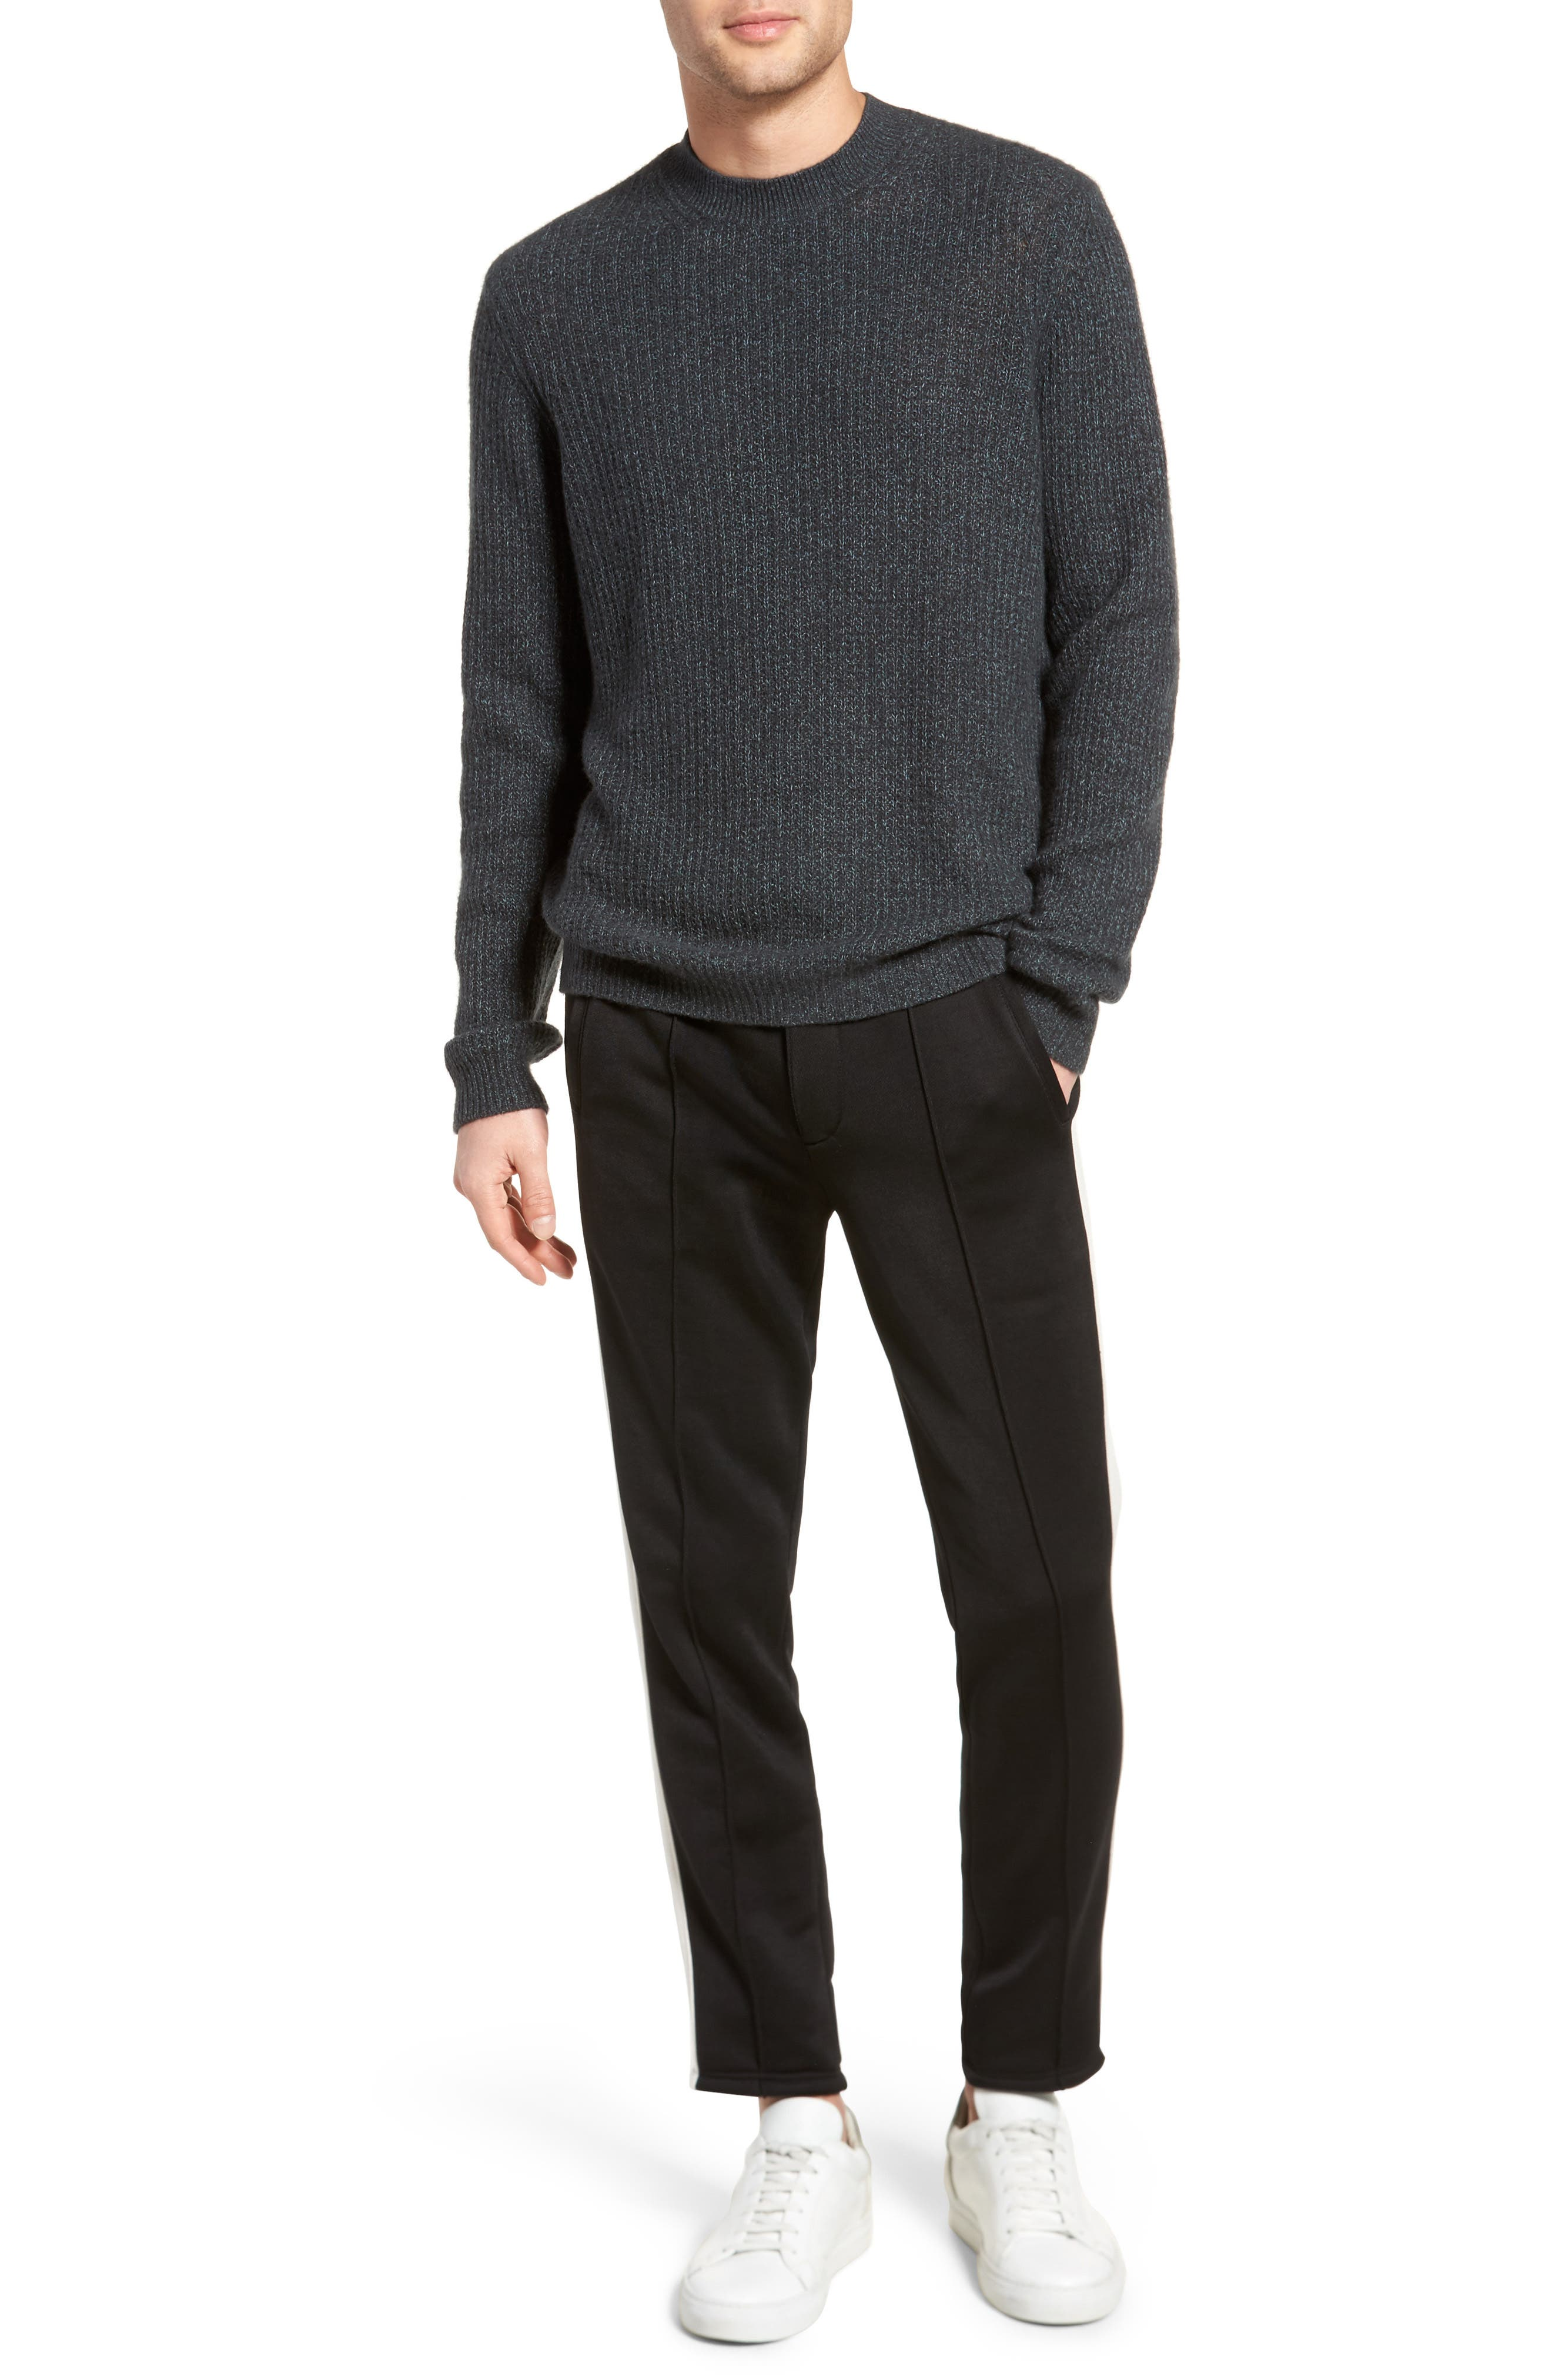 Thermal Knit Crewneck Cashmere Sweater,                             Alternate thumbnail 7, color,                             Beetle/ Mint